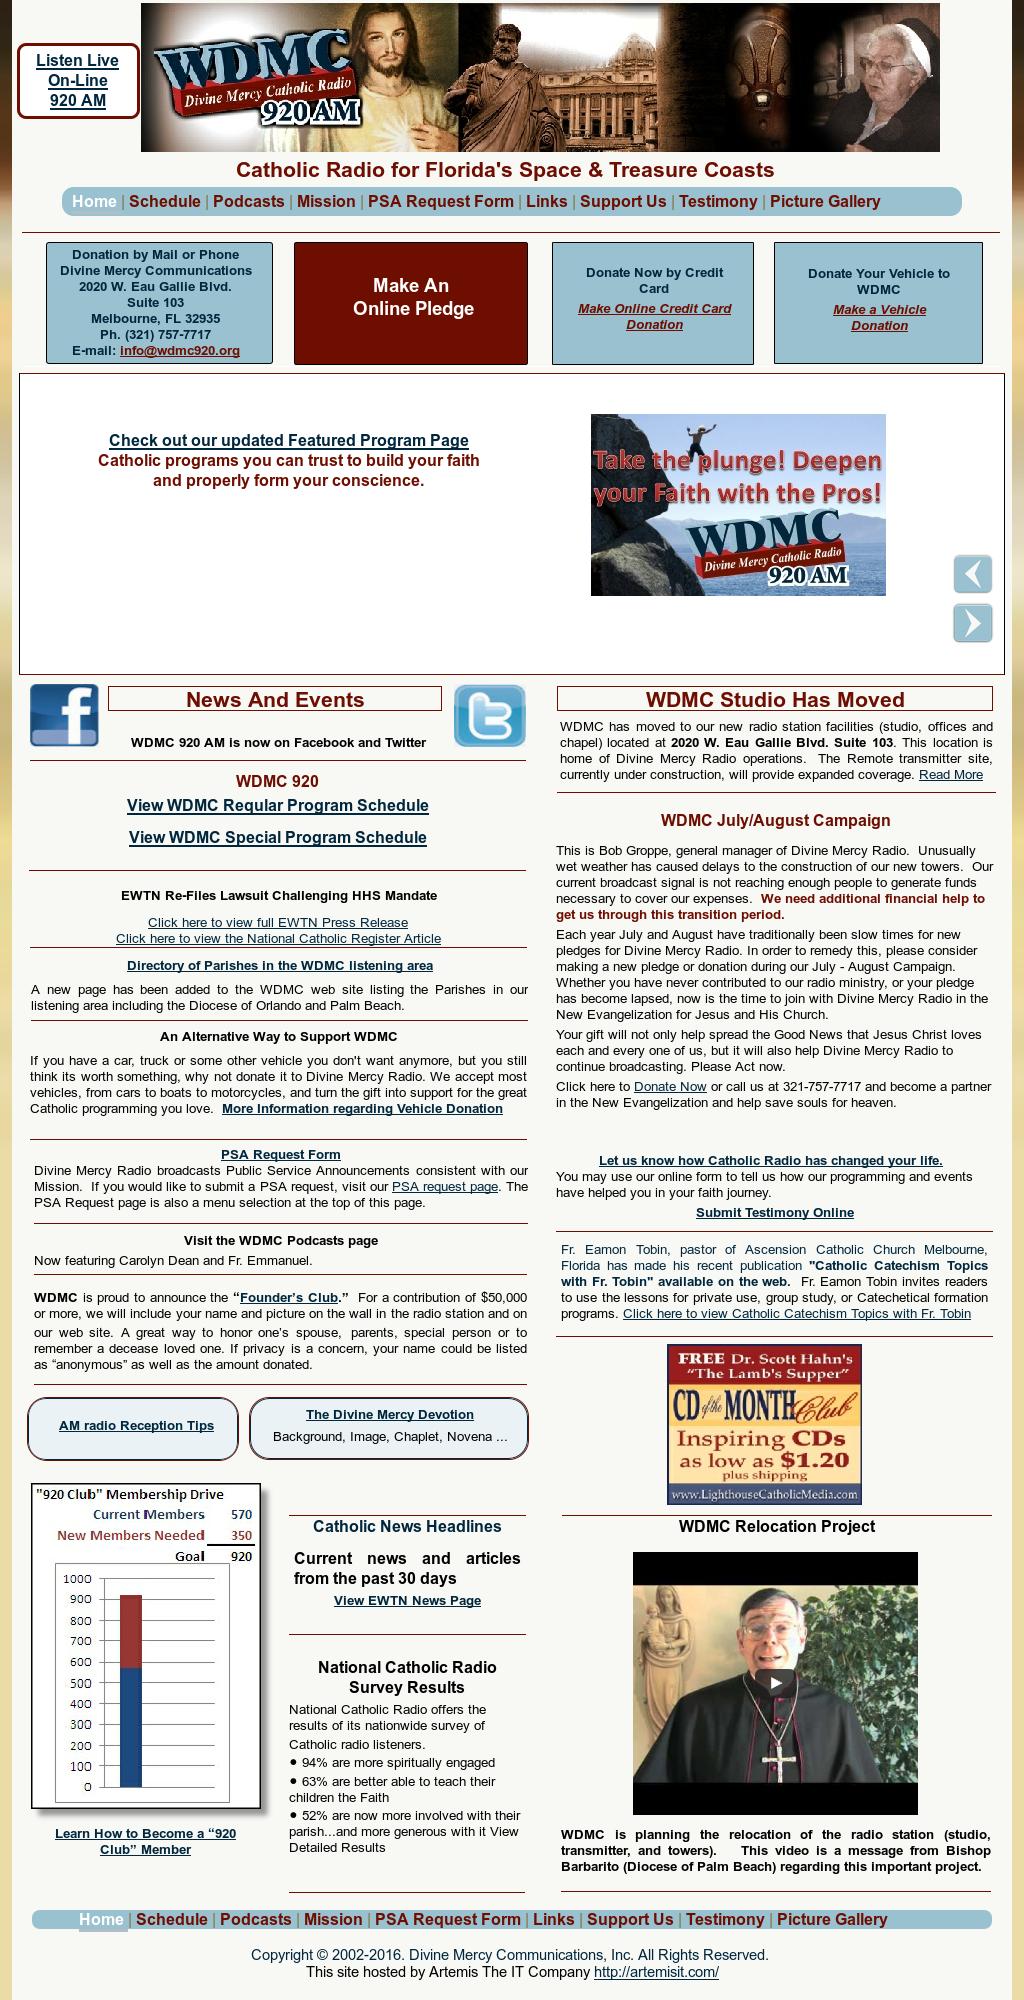 WDMC Competitors, Revenue and Employees - Owler Company Profile